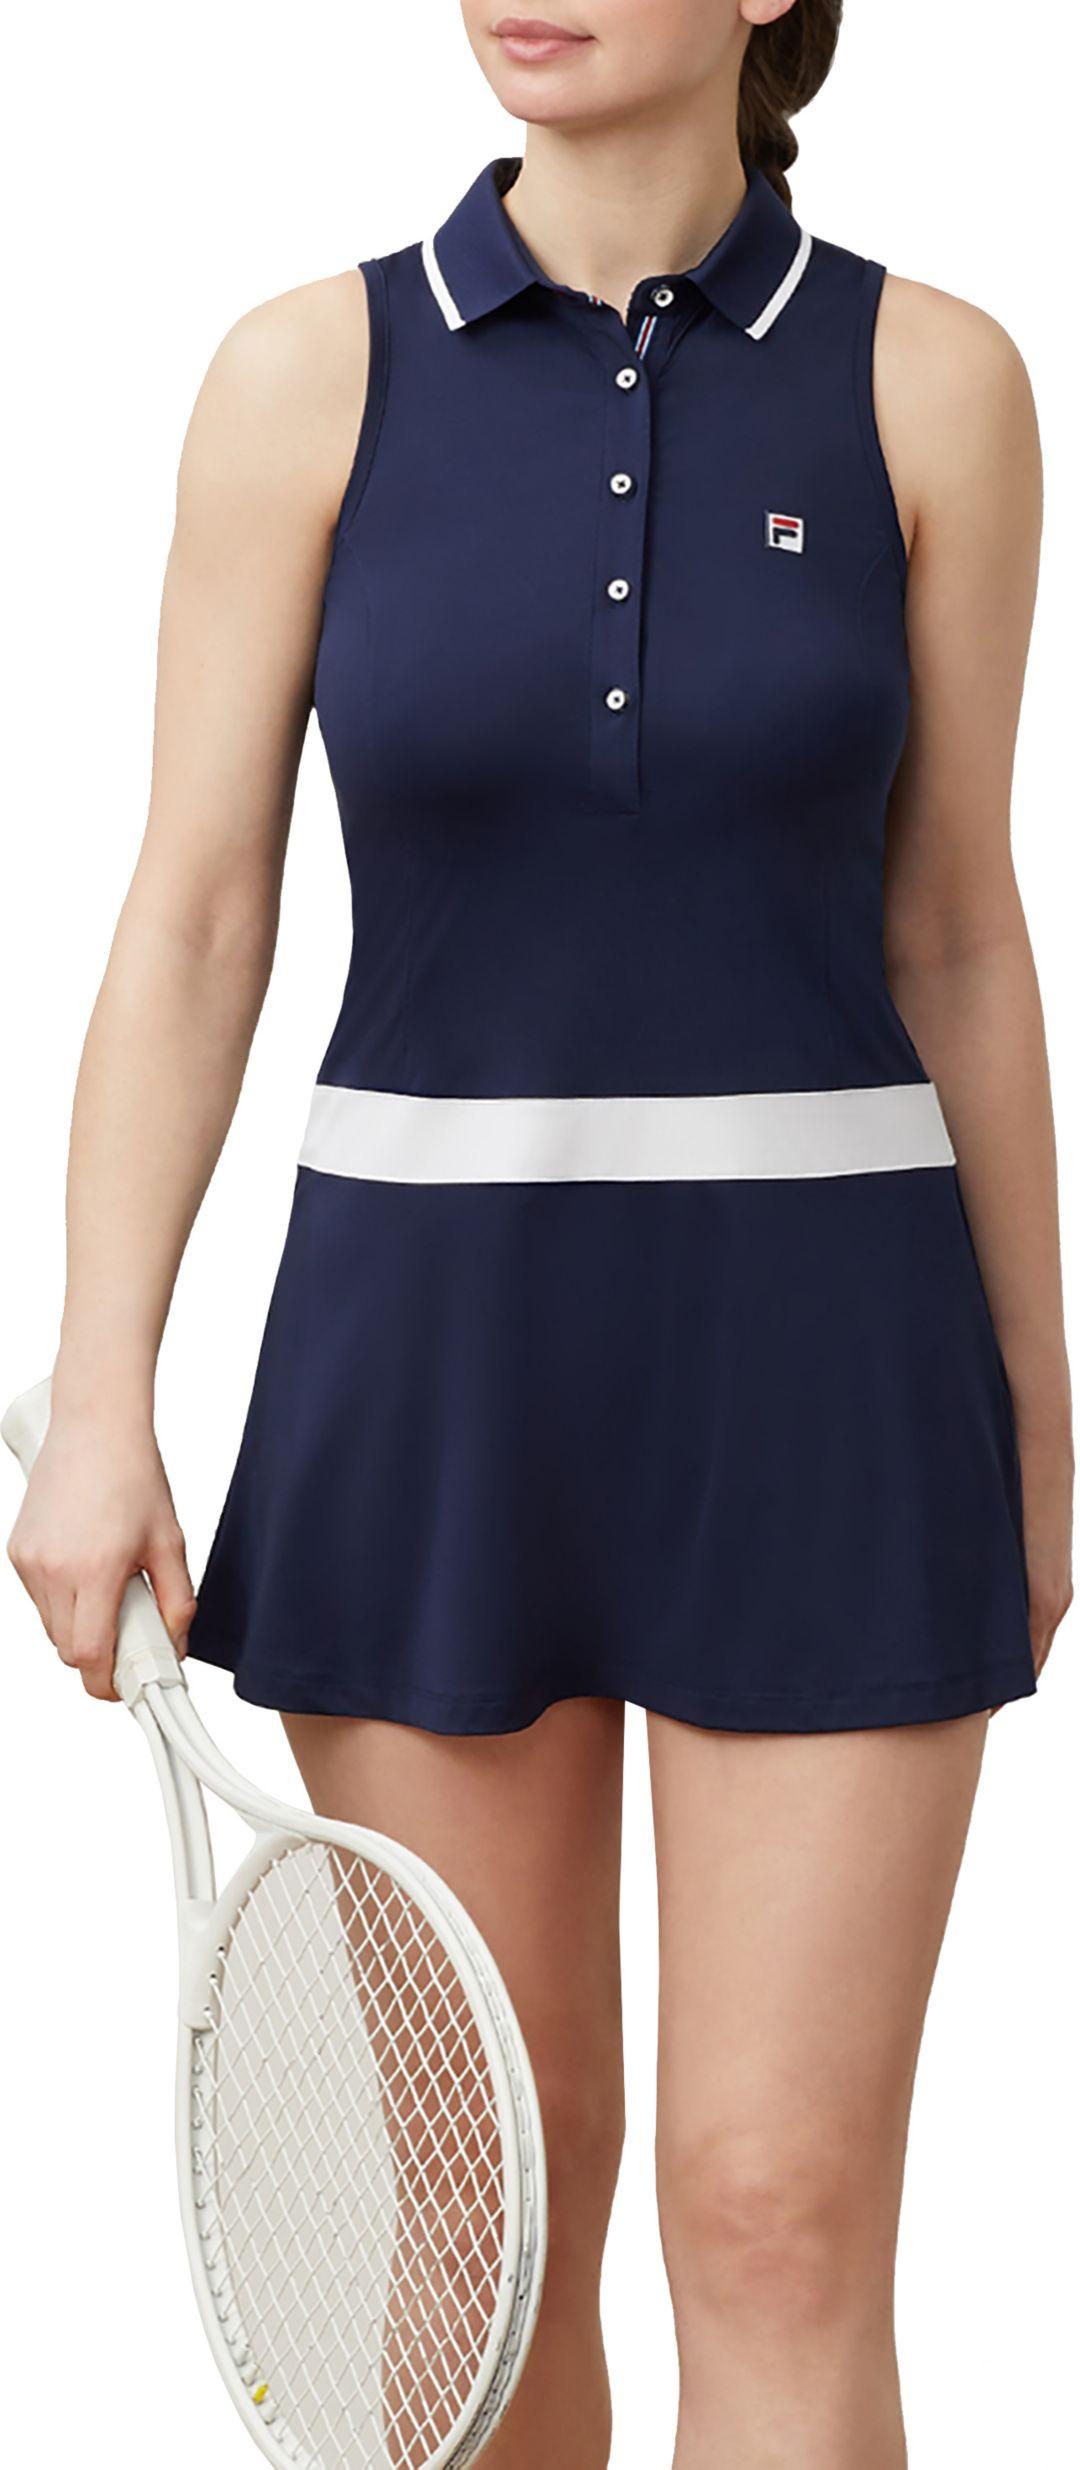 Fila Women's Heritage Tennis Polo Dress